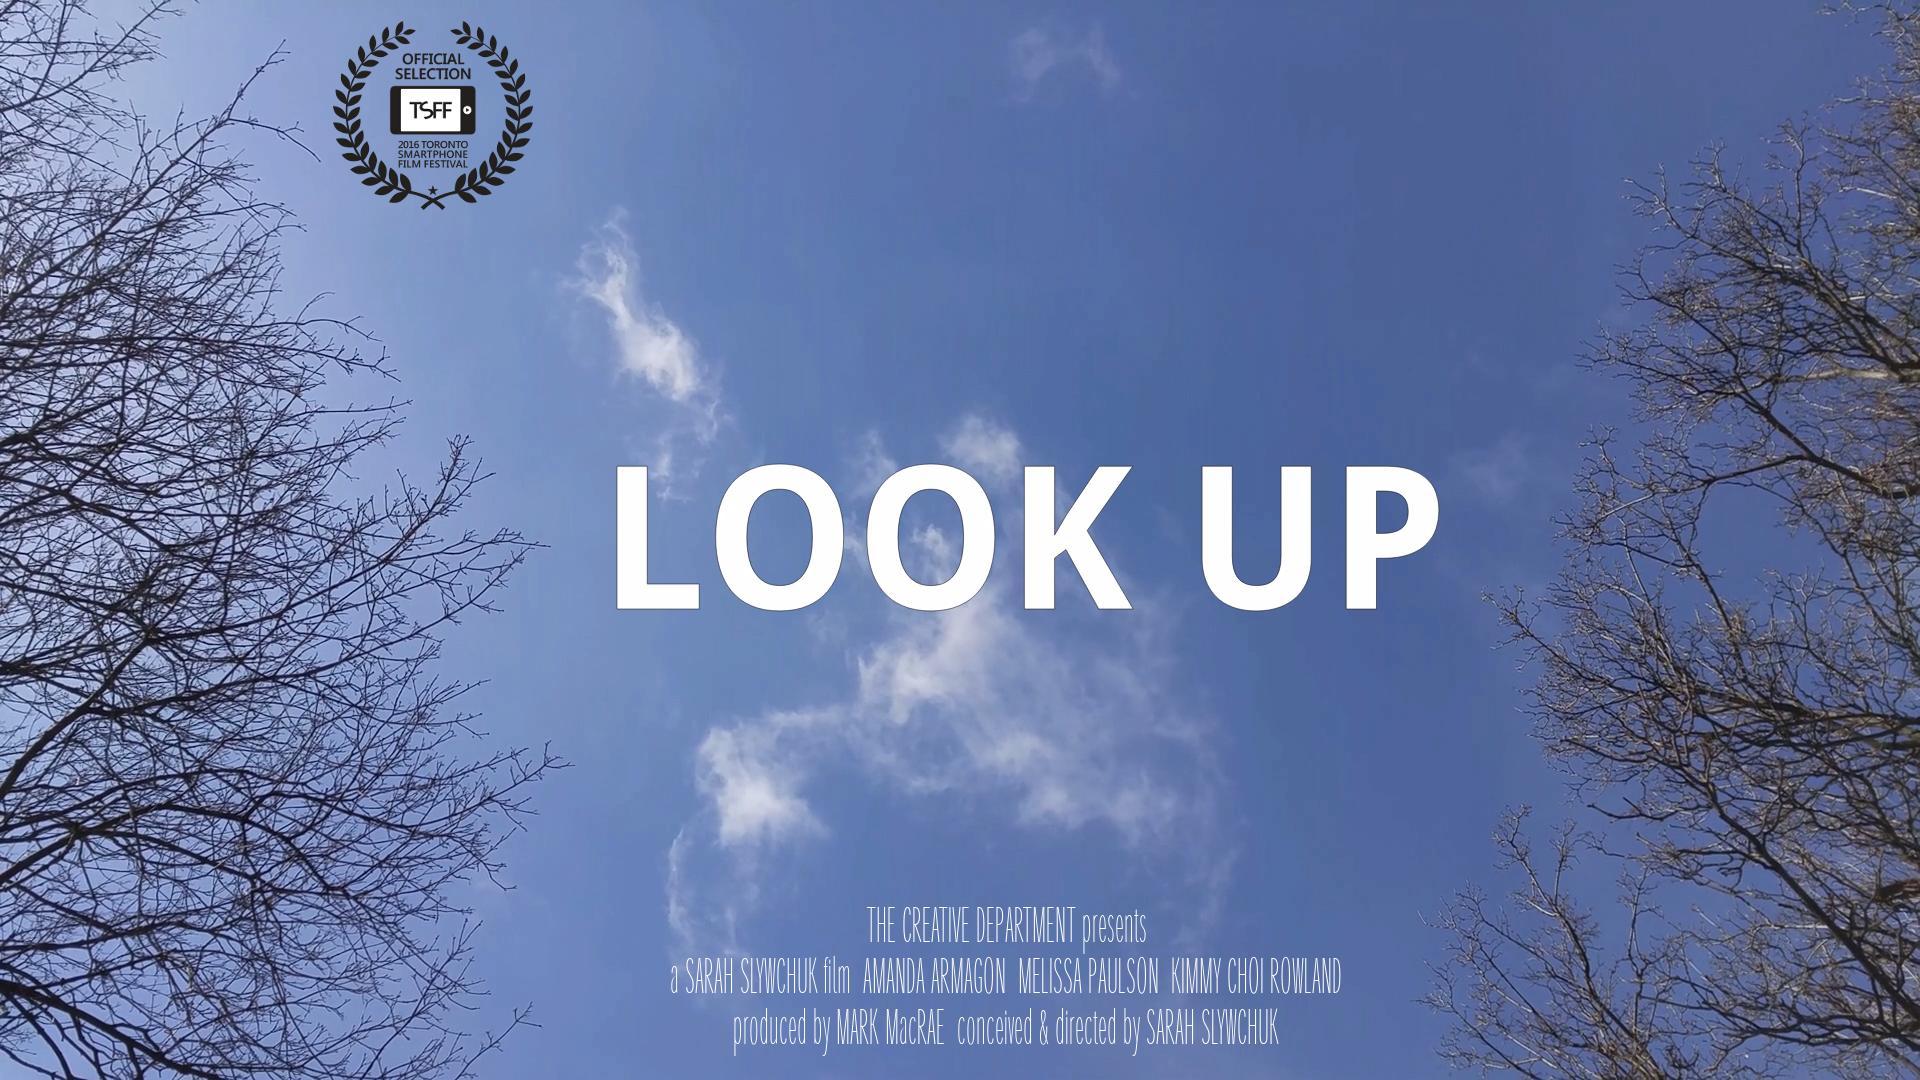 Look Up: A Mini Film (2016)